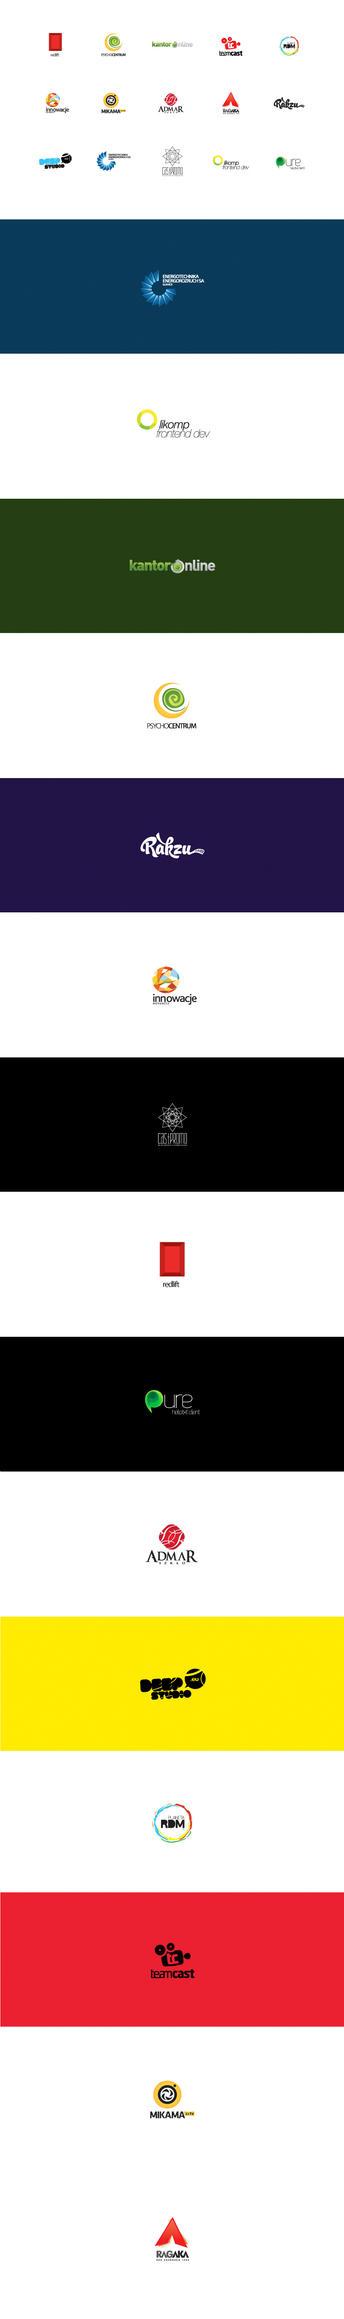 Logofoilo 2010 by meleKr